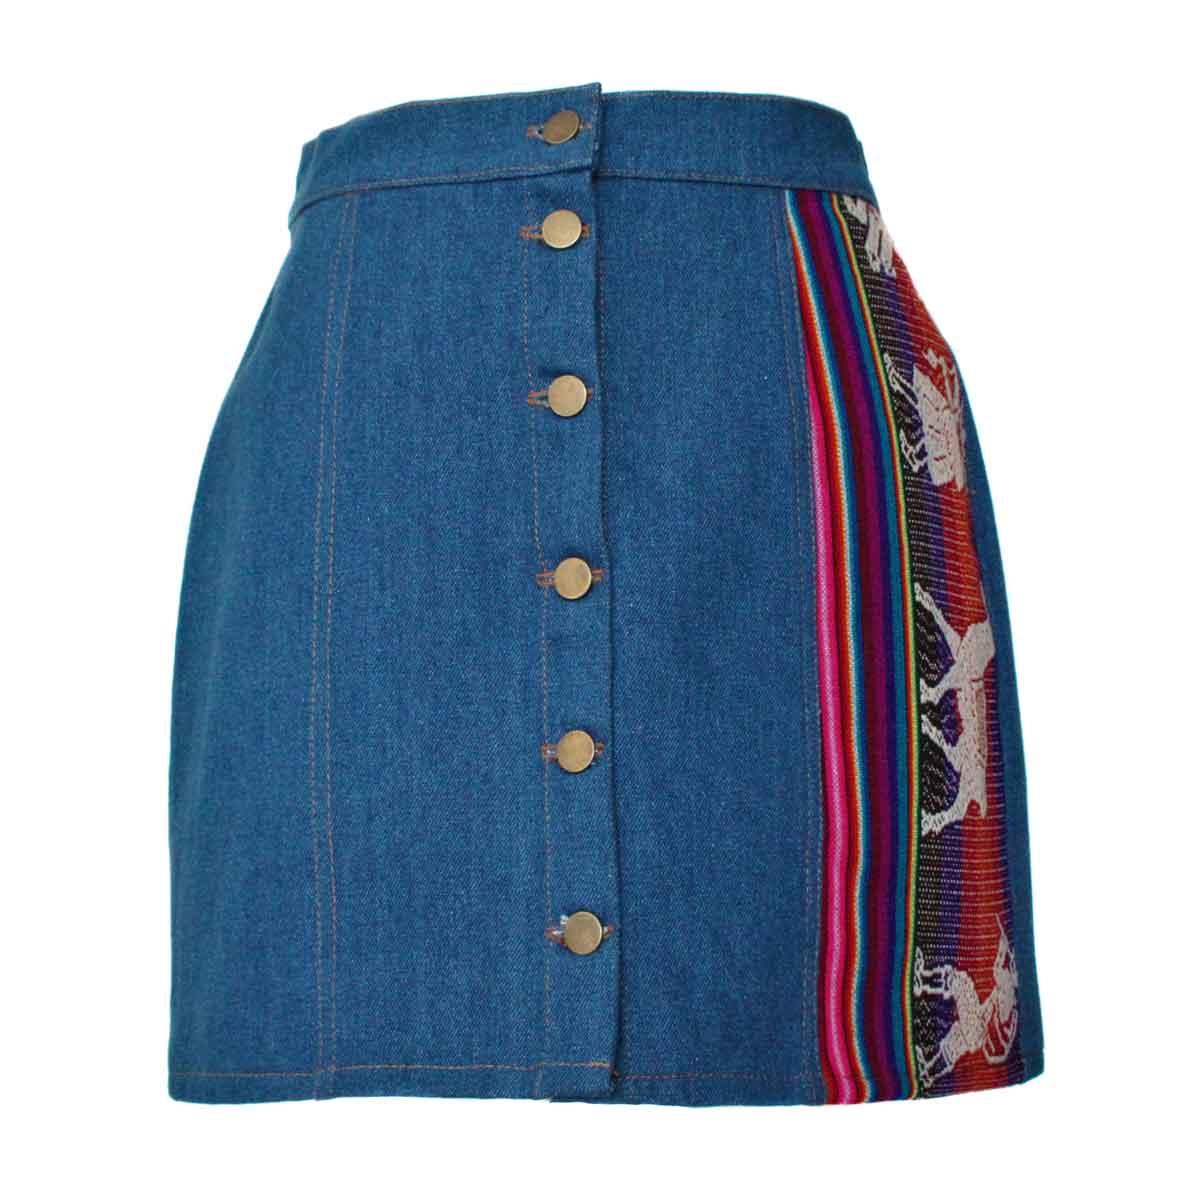 Inka-Products-Mini-jupe Femme Denim Bleu Jean-Tissu Traditionnel Andin Coloré